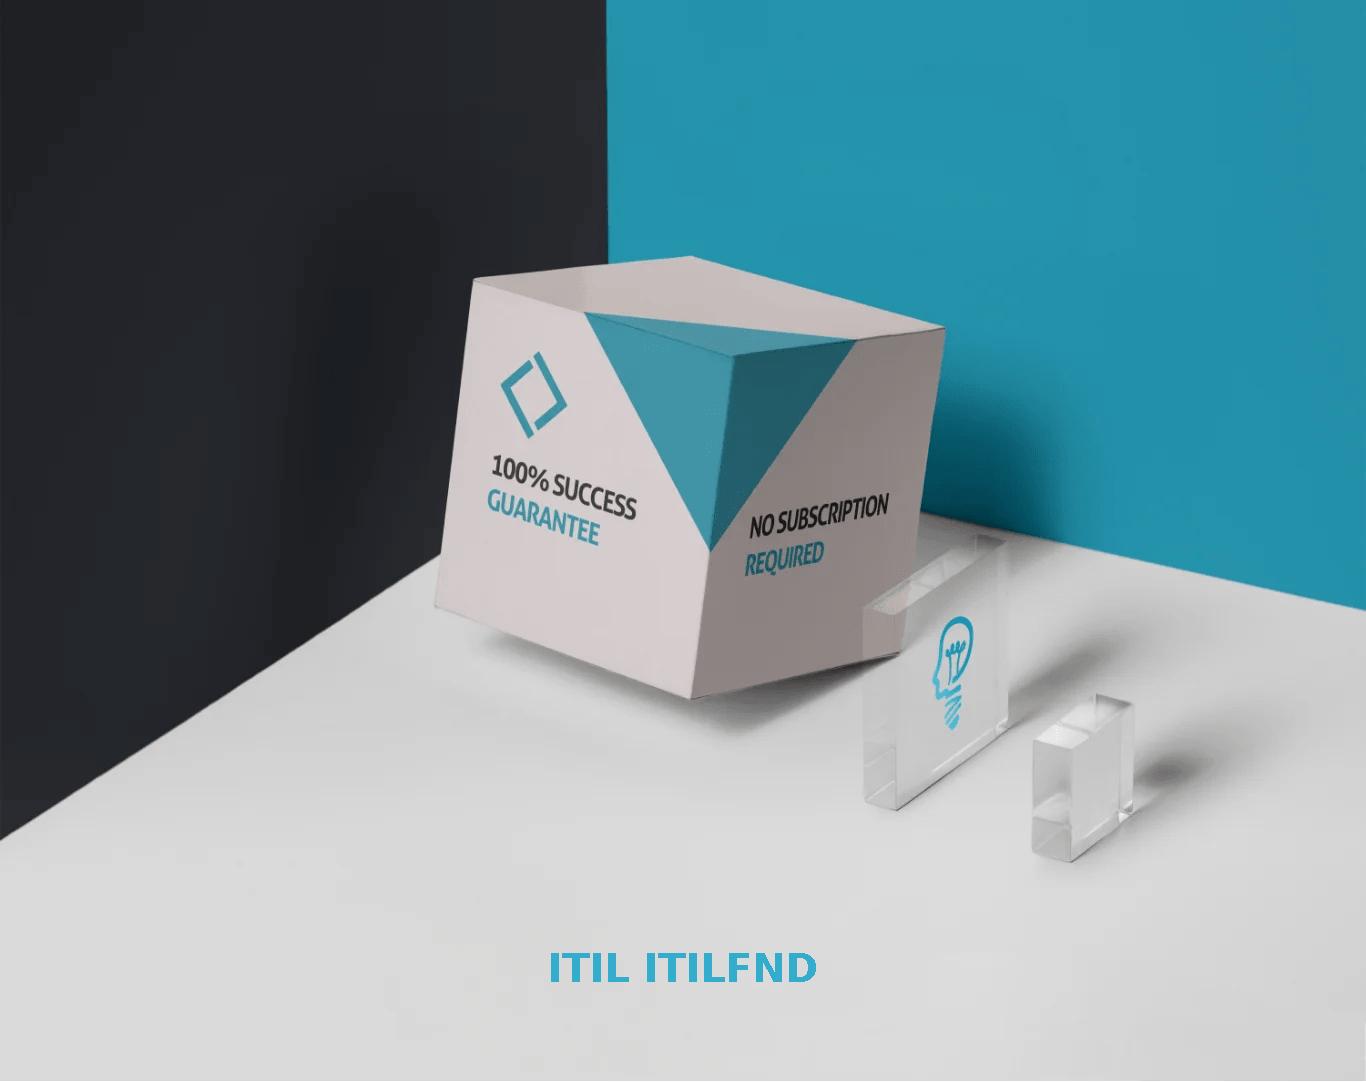 ITILFND Dumps